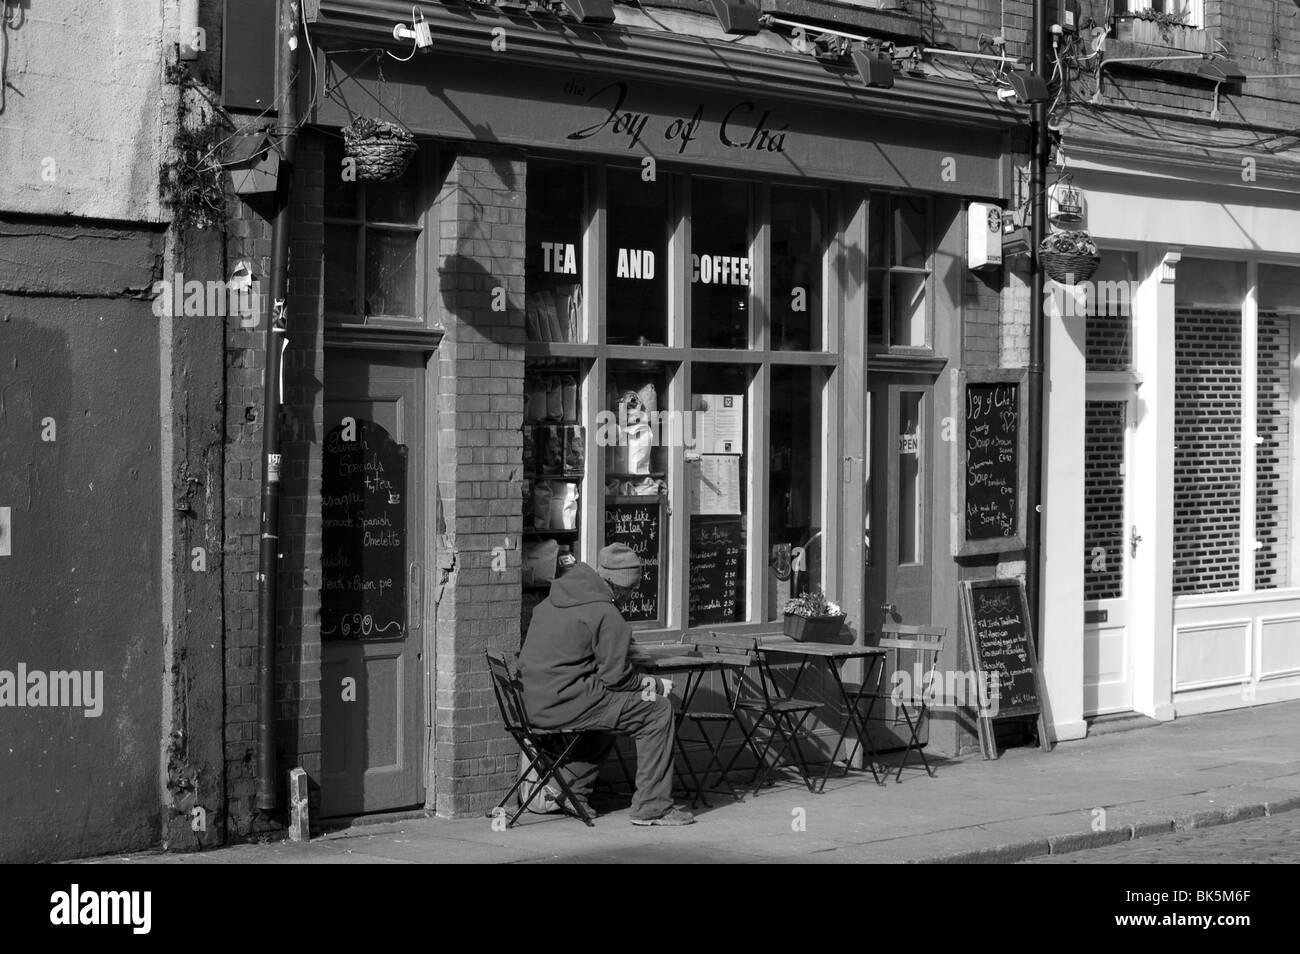 Tea shop, Temple Bar, Dublin - Stock Image